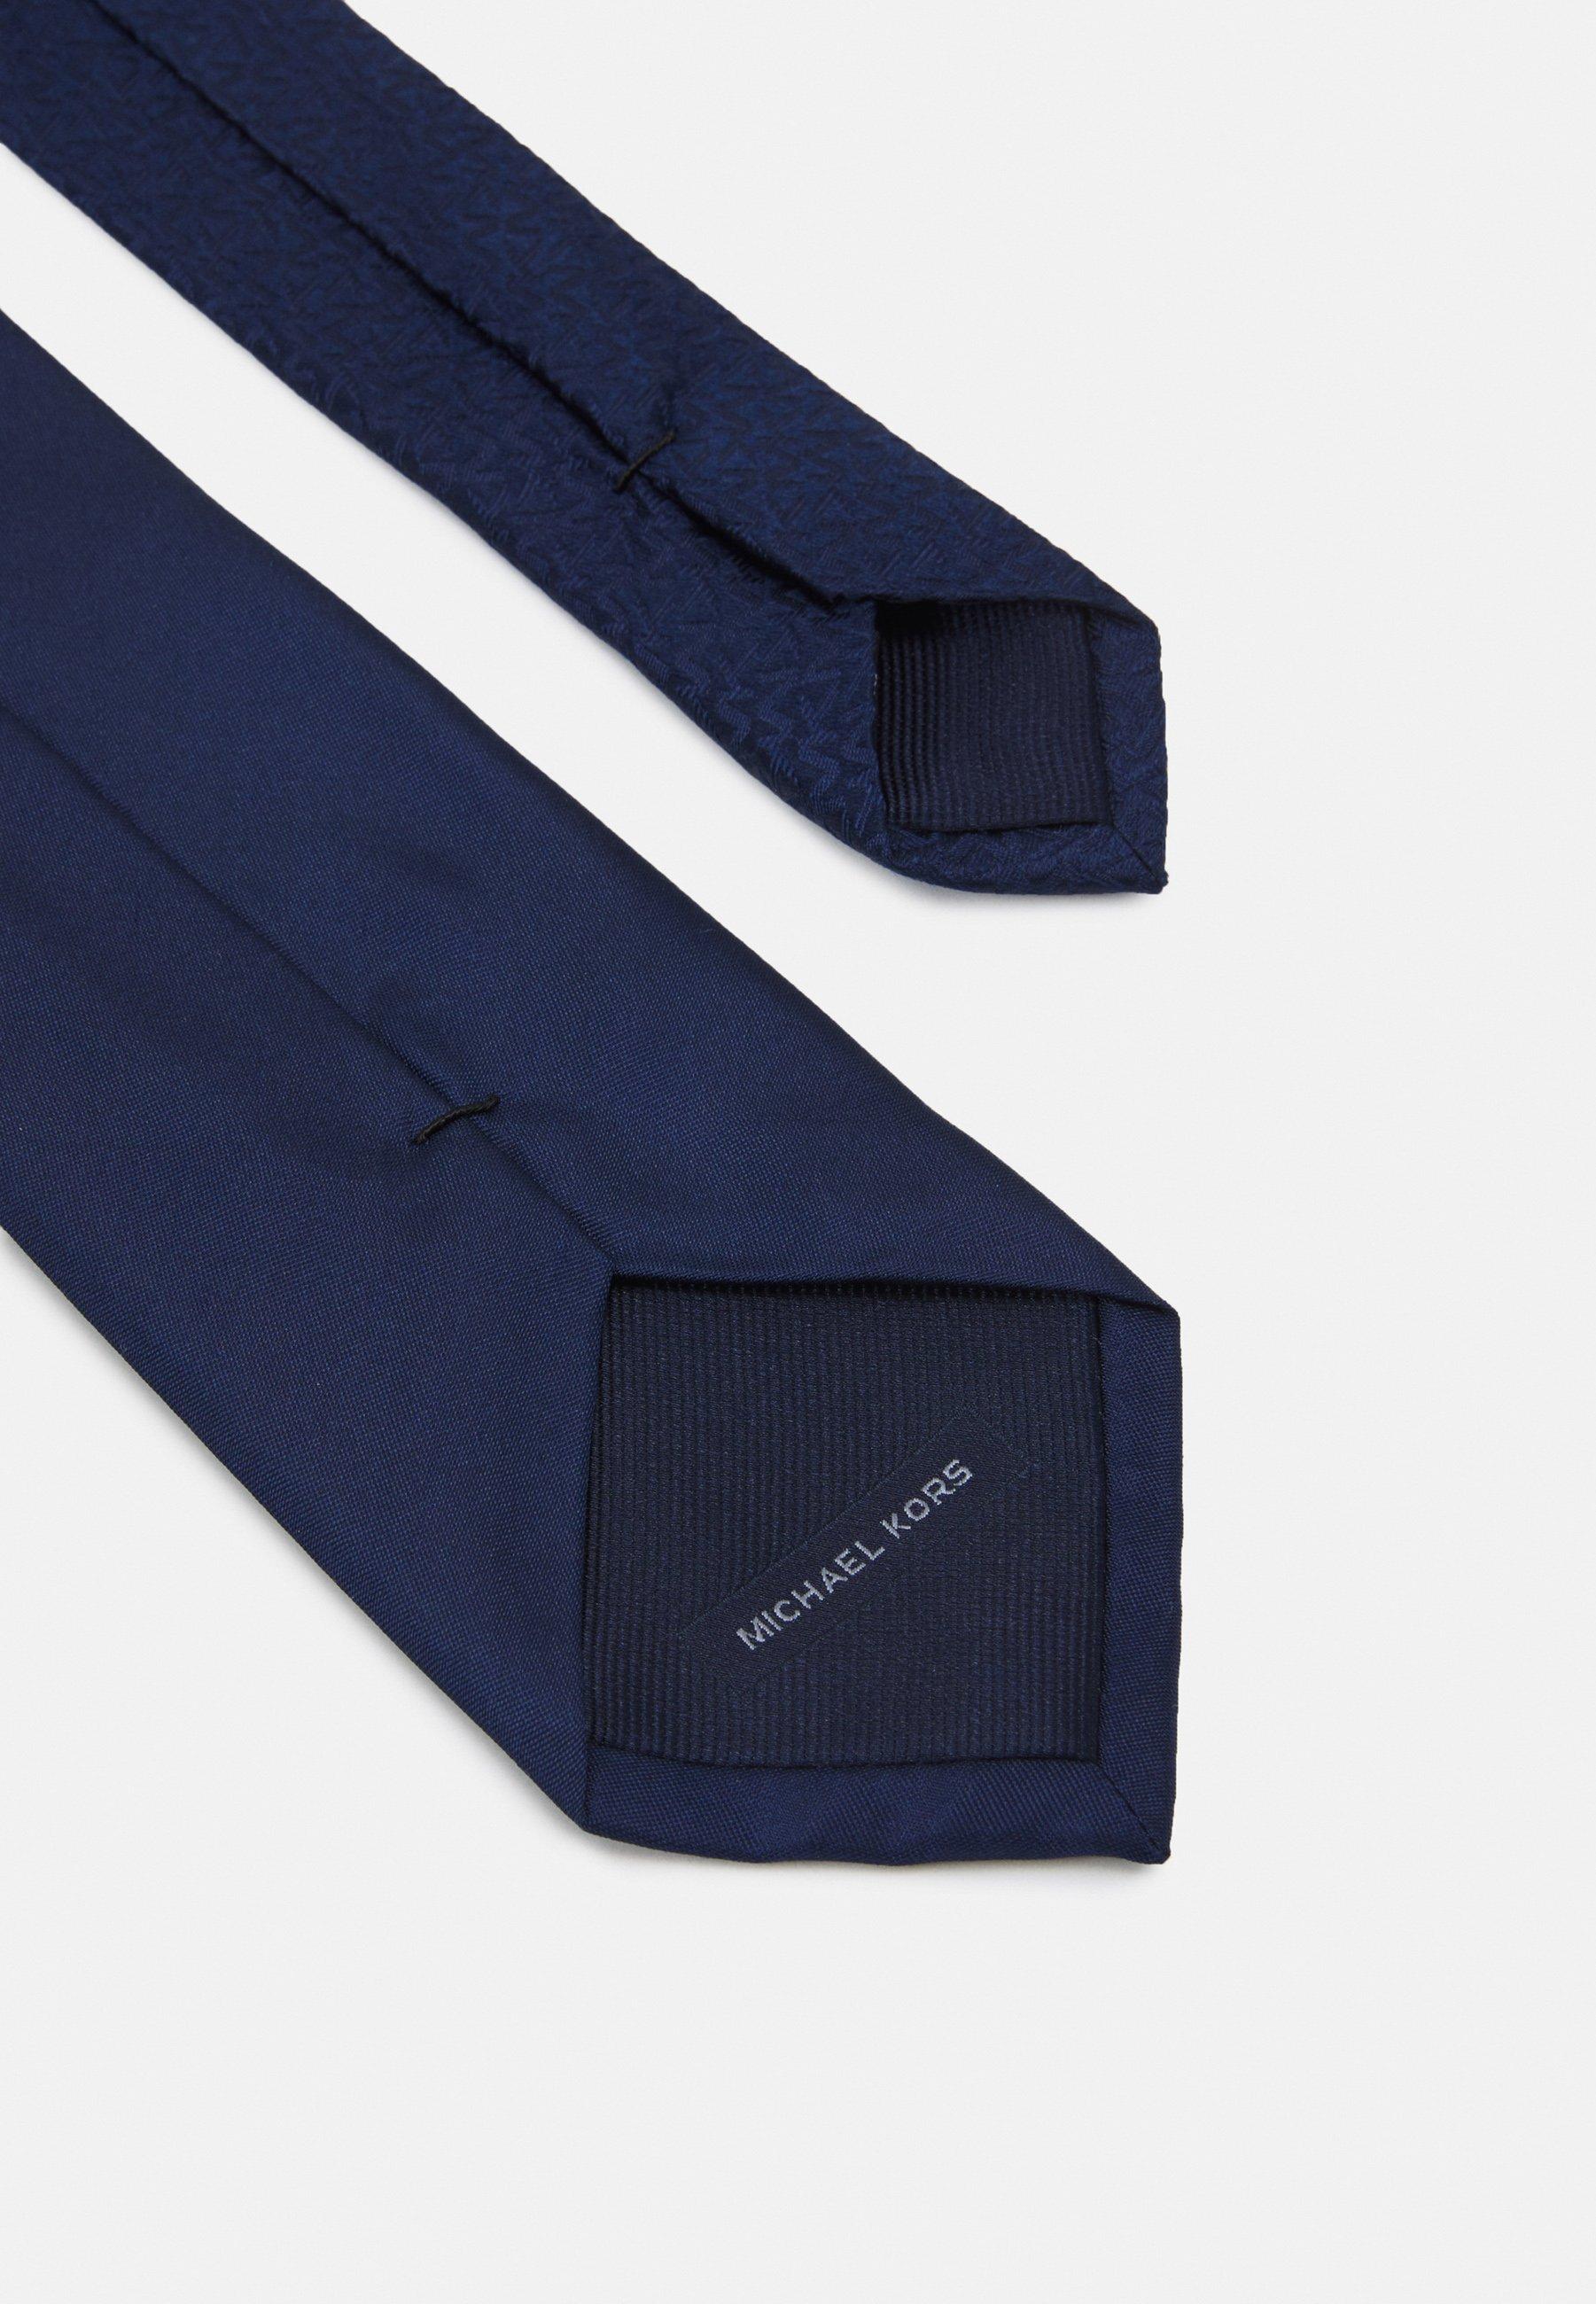 Uomo SAPPHIRE SOLID - Cravatta